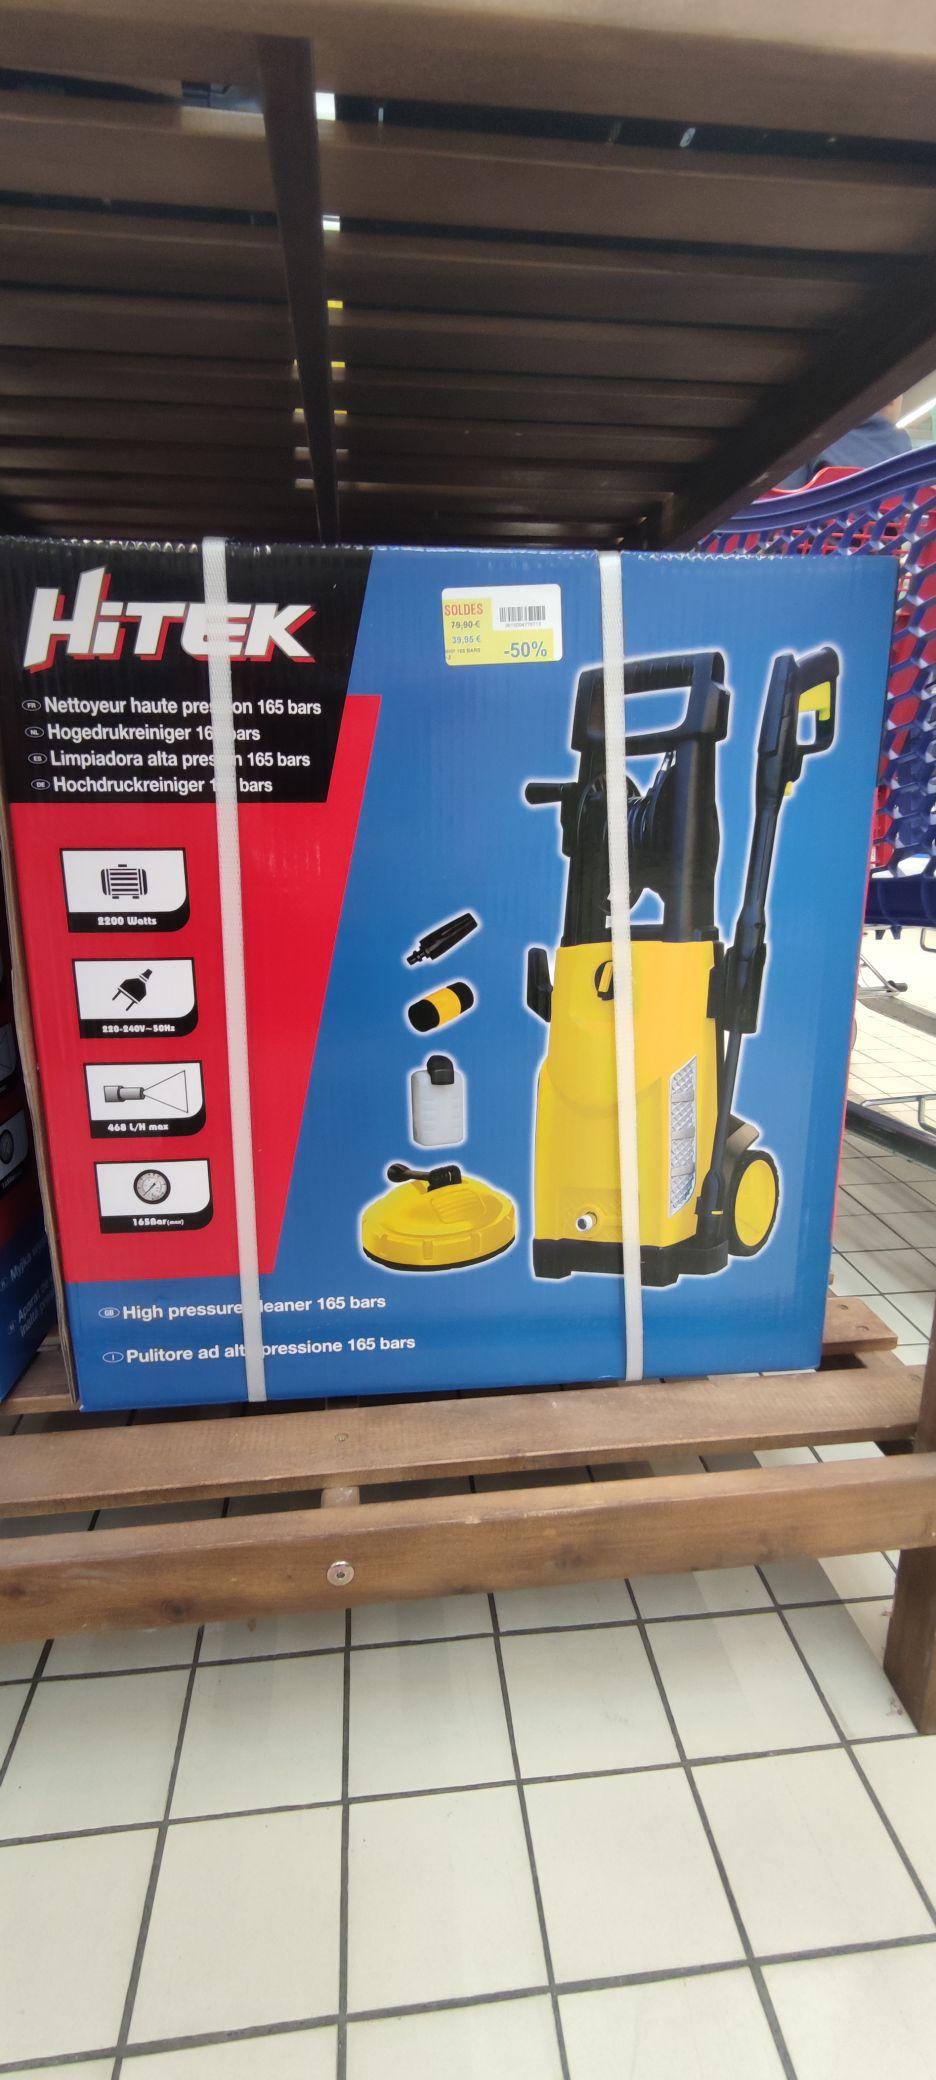 Nettoyeur haute pression Hitek NHP (165 bars) - Labège (31)